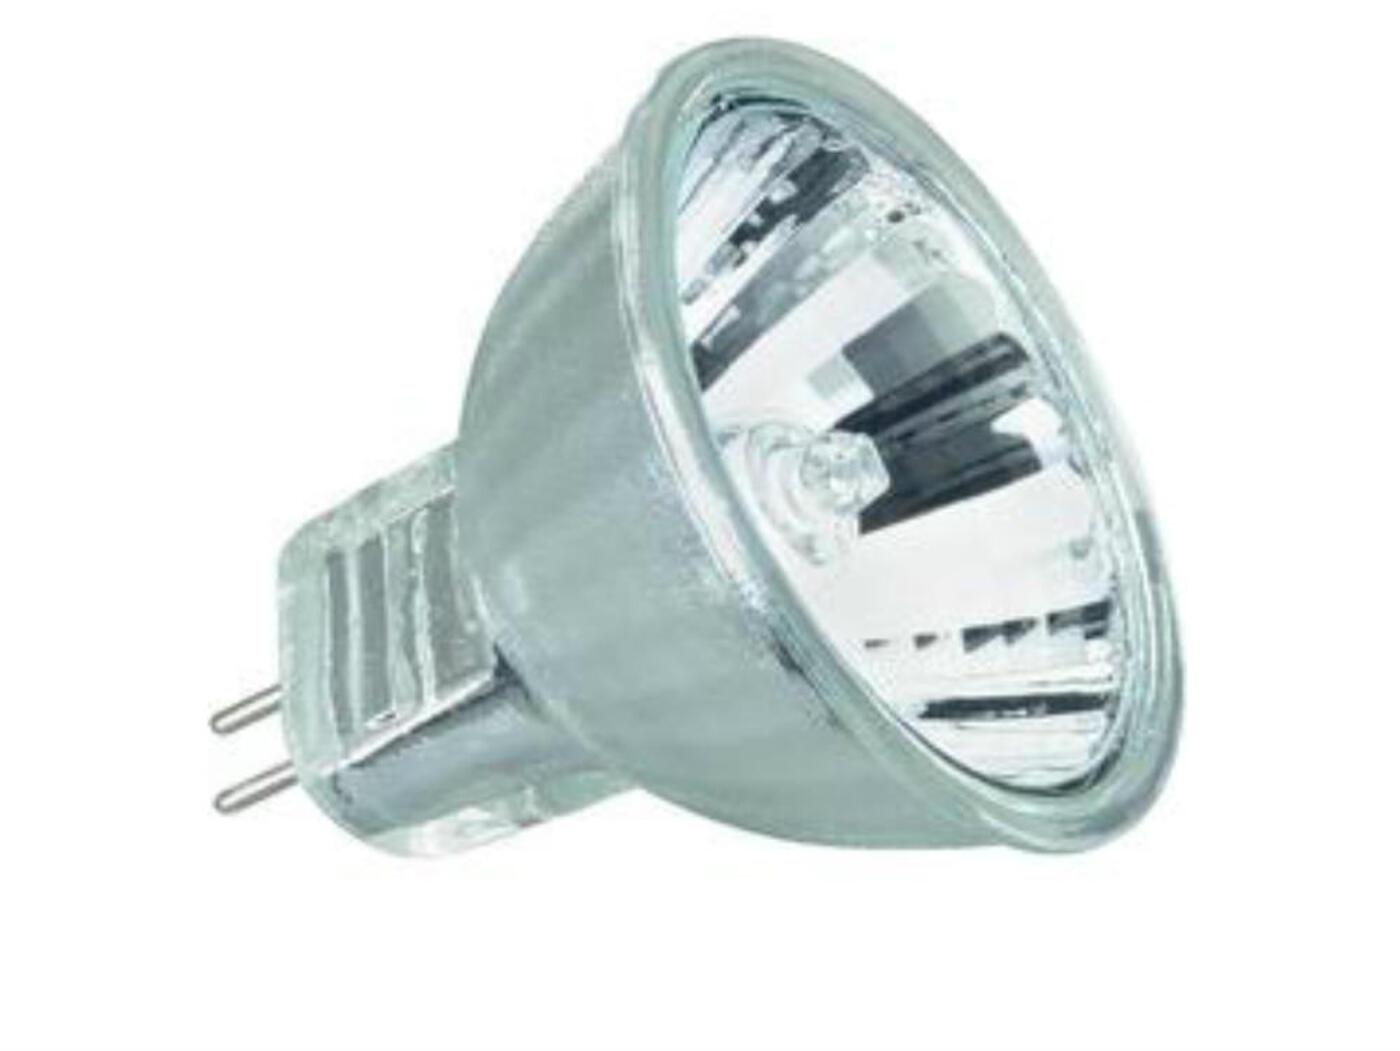 halogen gu5 3 reflector bulbs. Black Bedroom Furniture Sets. Home Design Ideas